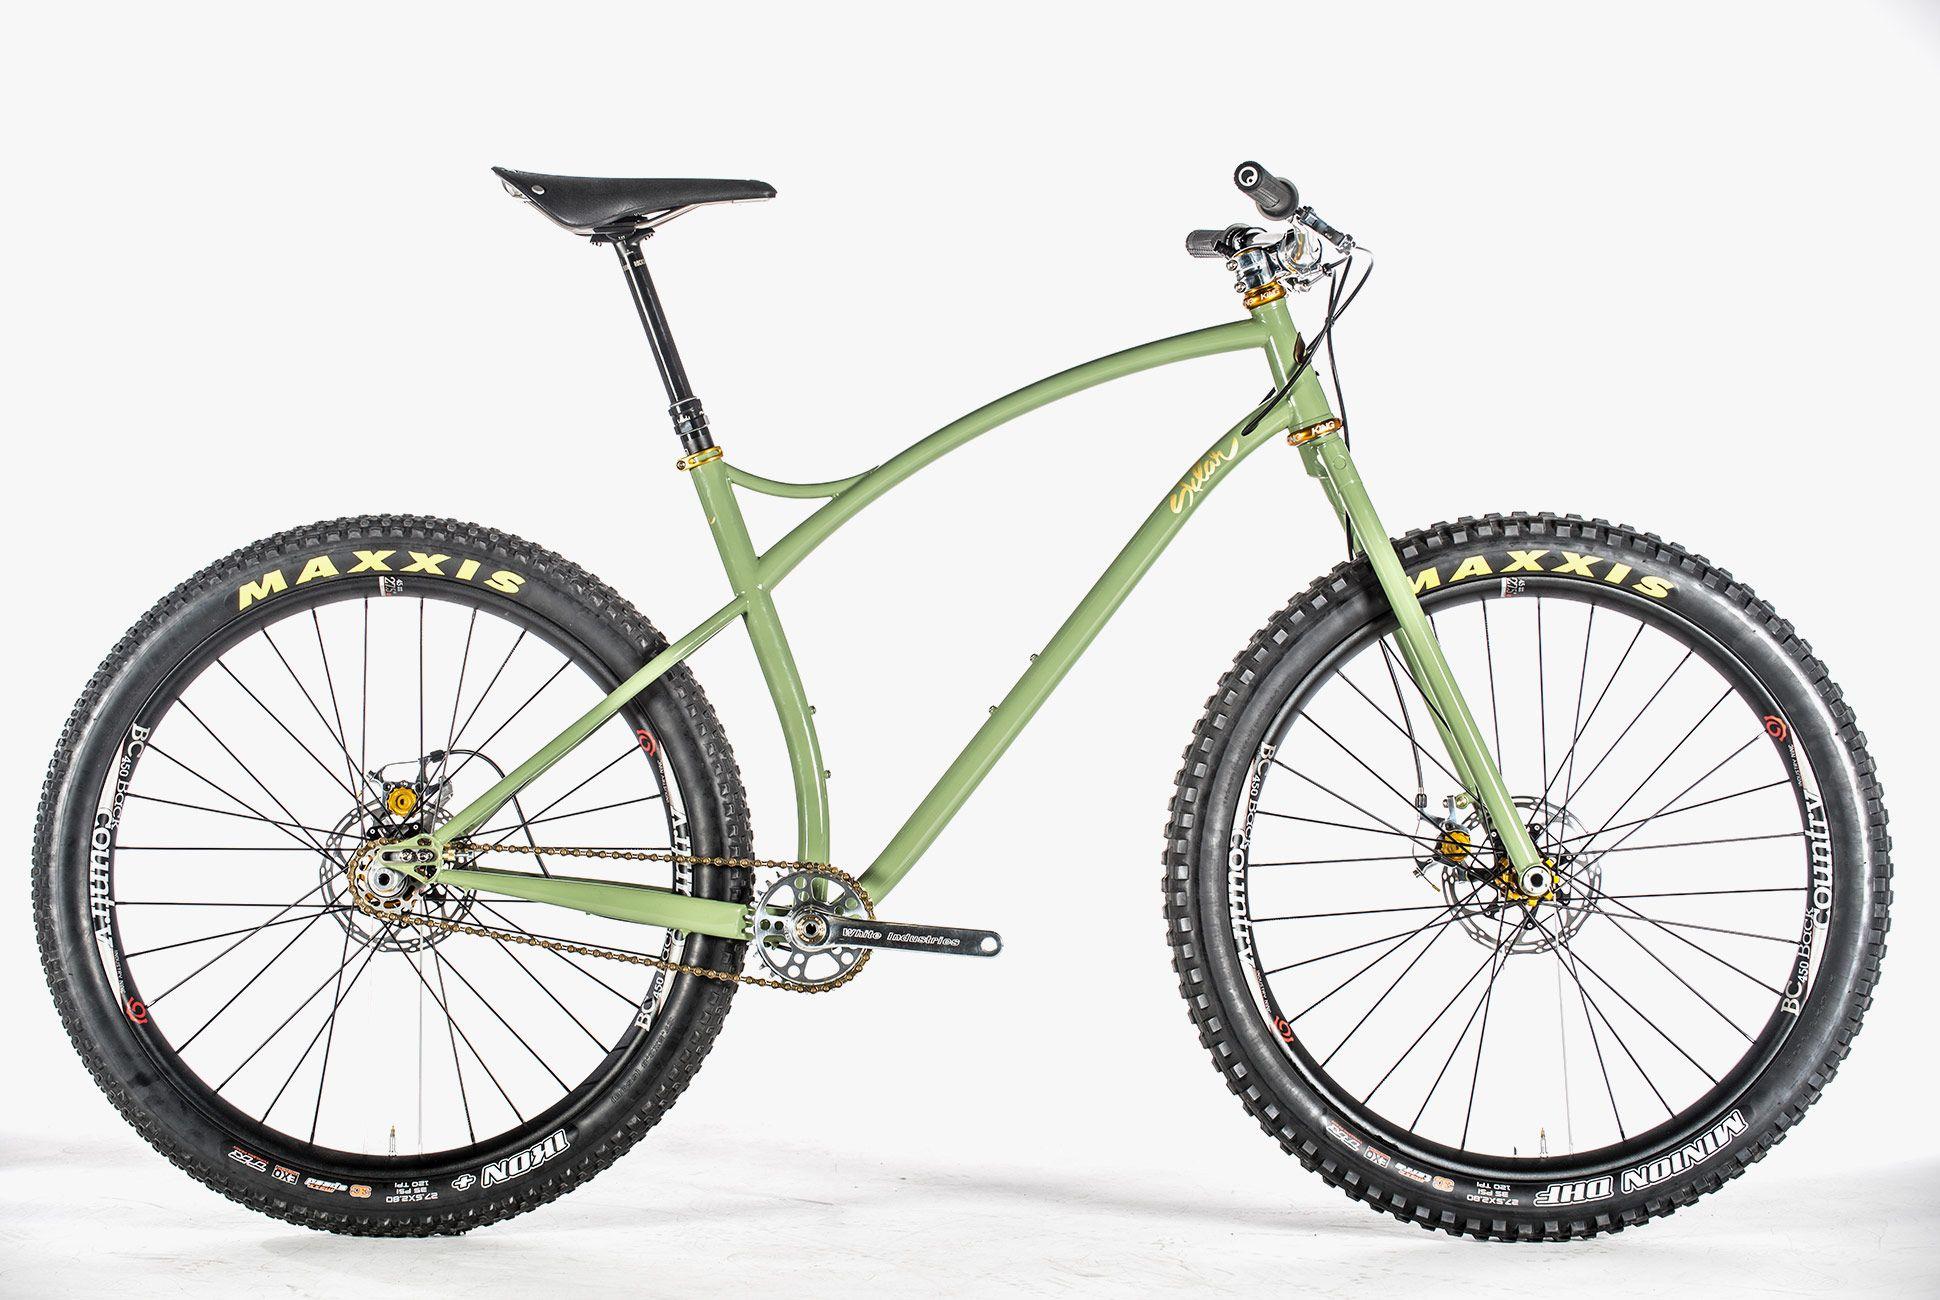 Bikes-From-NAHBS-Gear-Patrol-13